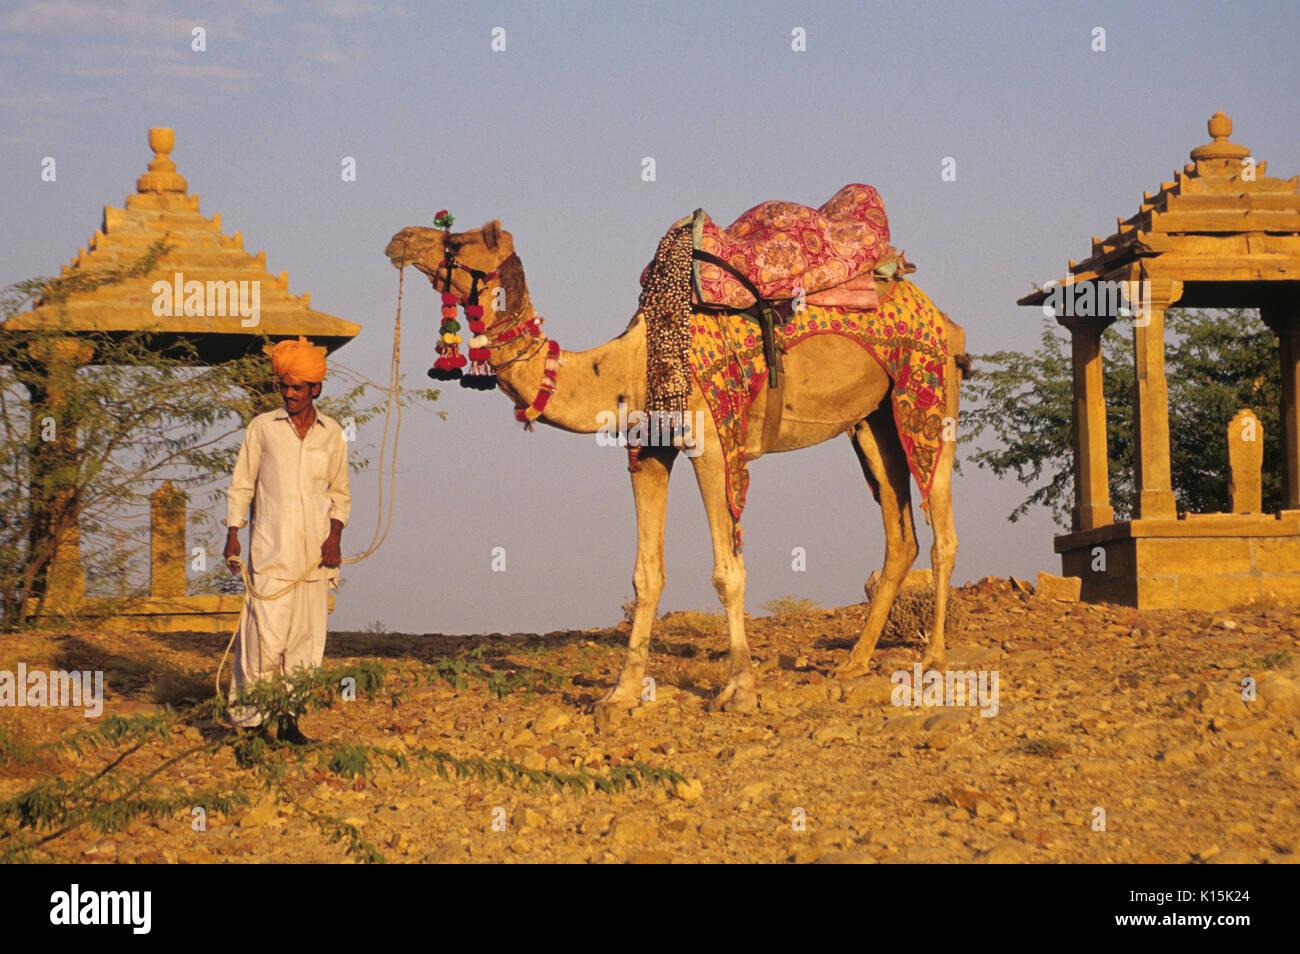 Rajasthani man with camel at Bada Bagh royal cenotaphs, Jaisalmer, Rajasthan, India - Stock Image